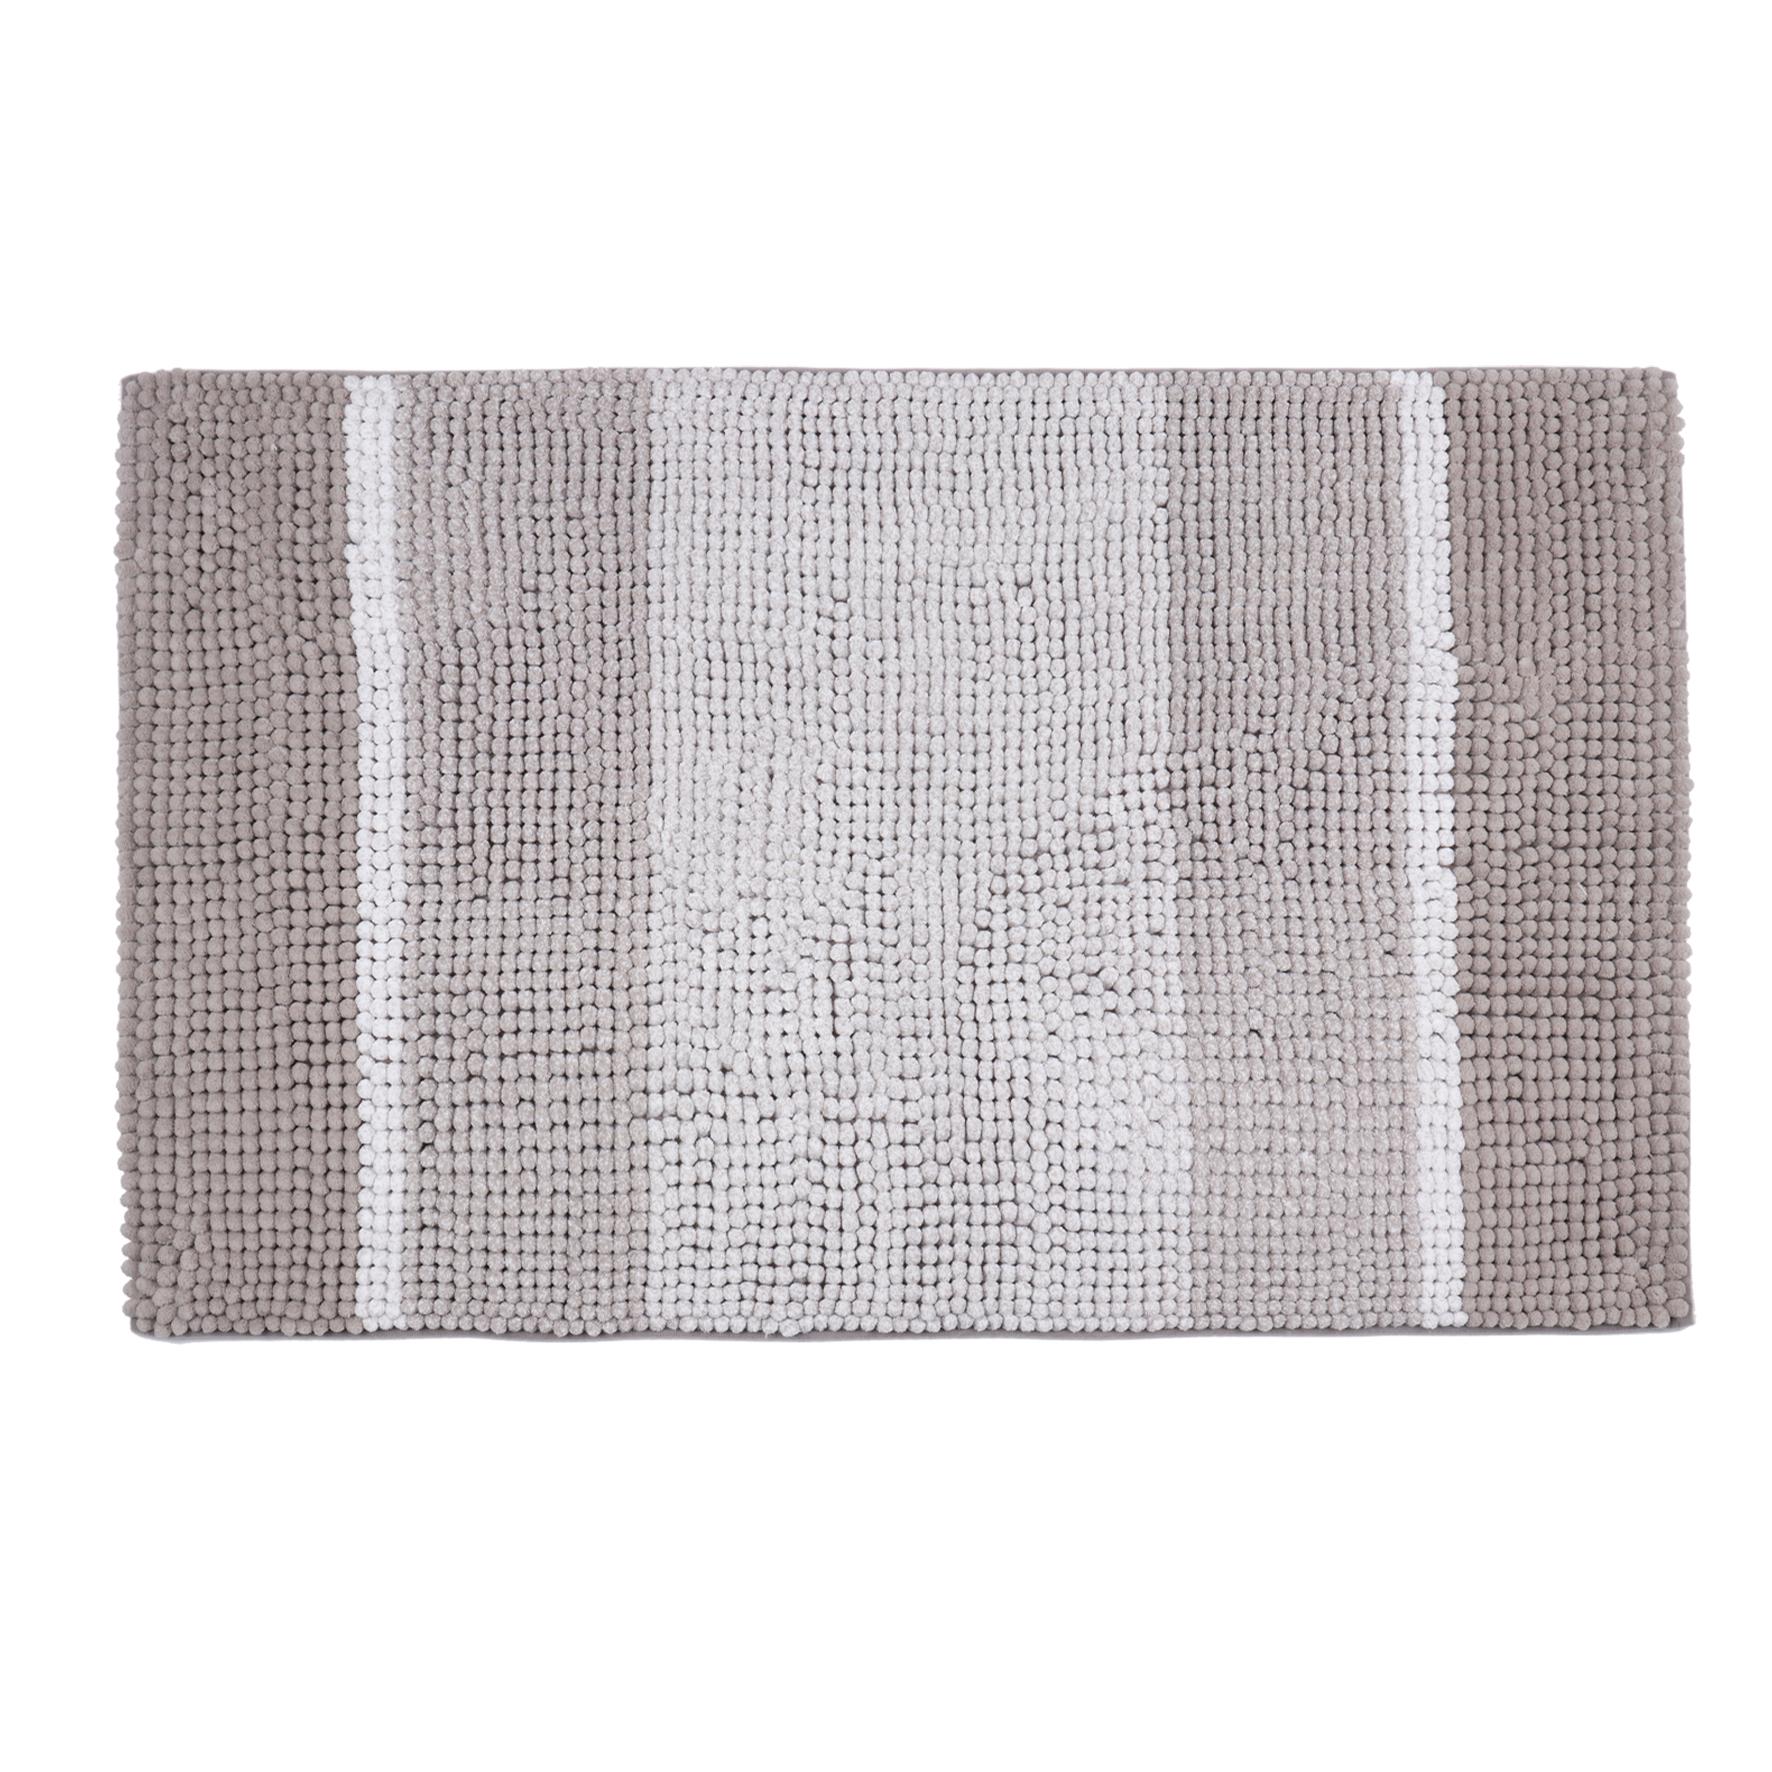 Differnz Fading badmat 60x90cm taupe